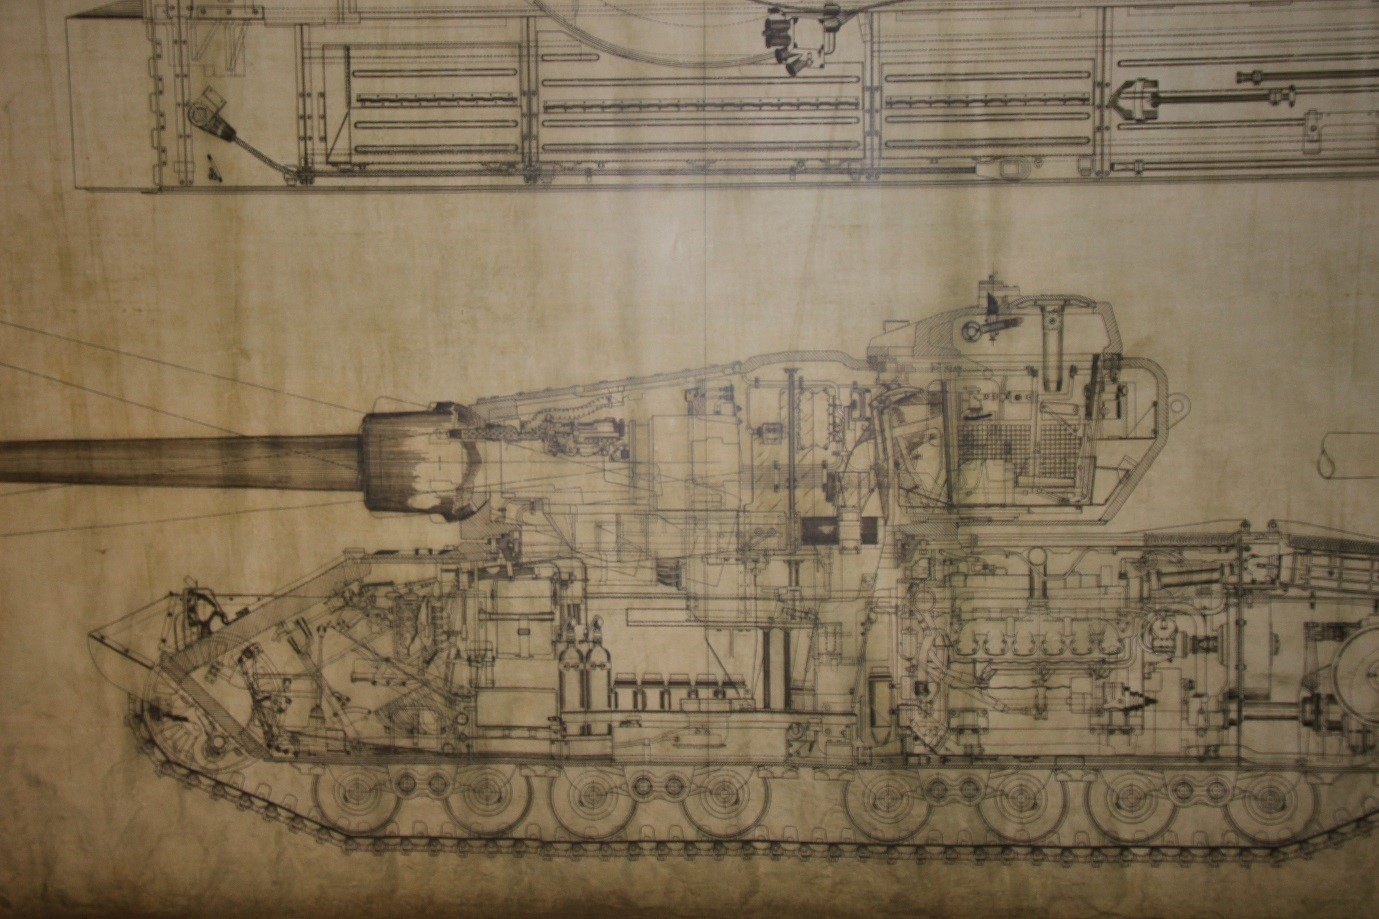 http://static-ptl-eu.gcdn.co/dcont/fb/image/bovington_tank_factory_10.jpg